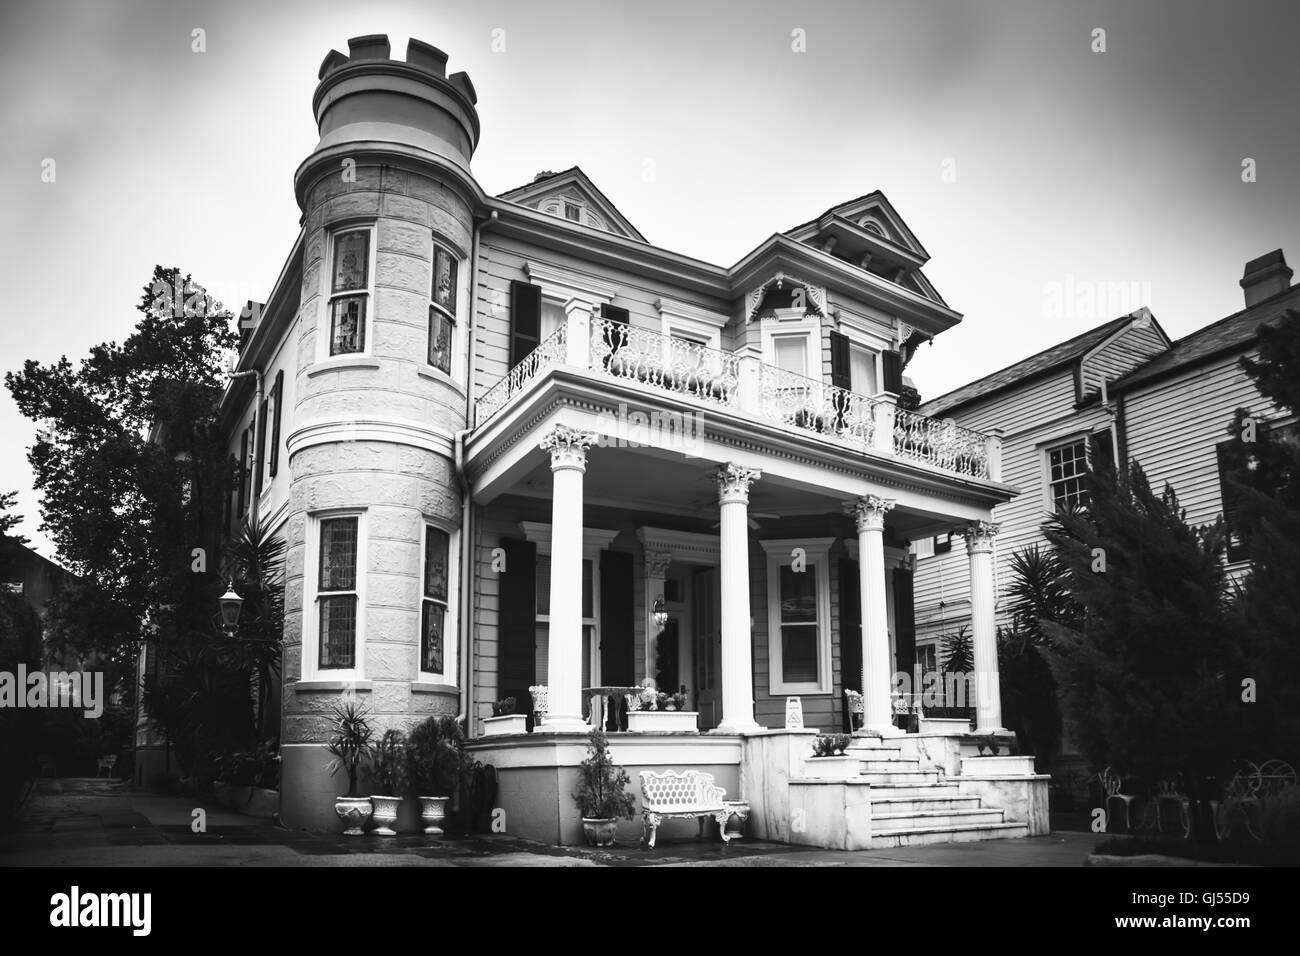 Cornstalk Hotel, French Quarter, New Orleans, Louisiana. 2016 Black and White Photo. - Stock Image